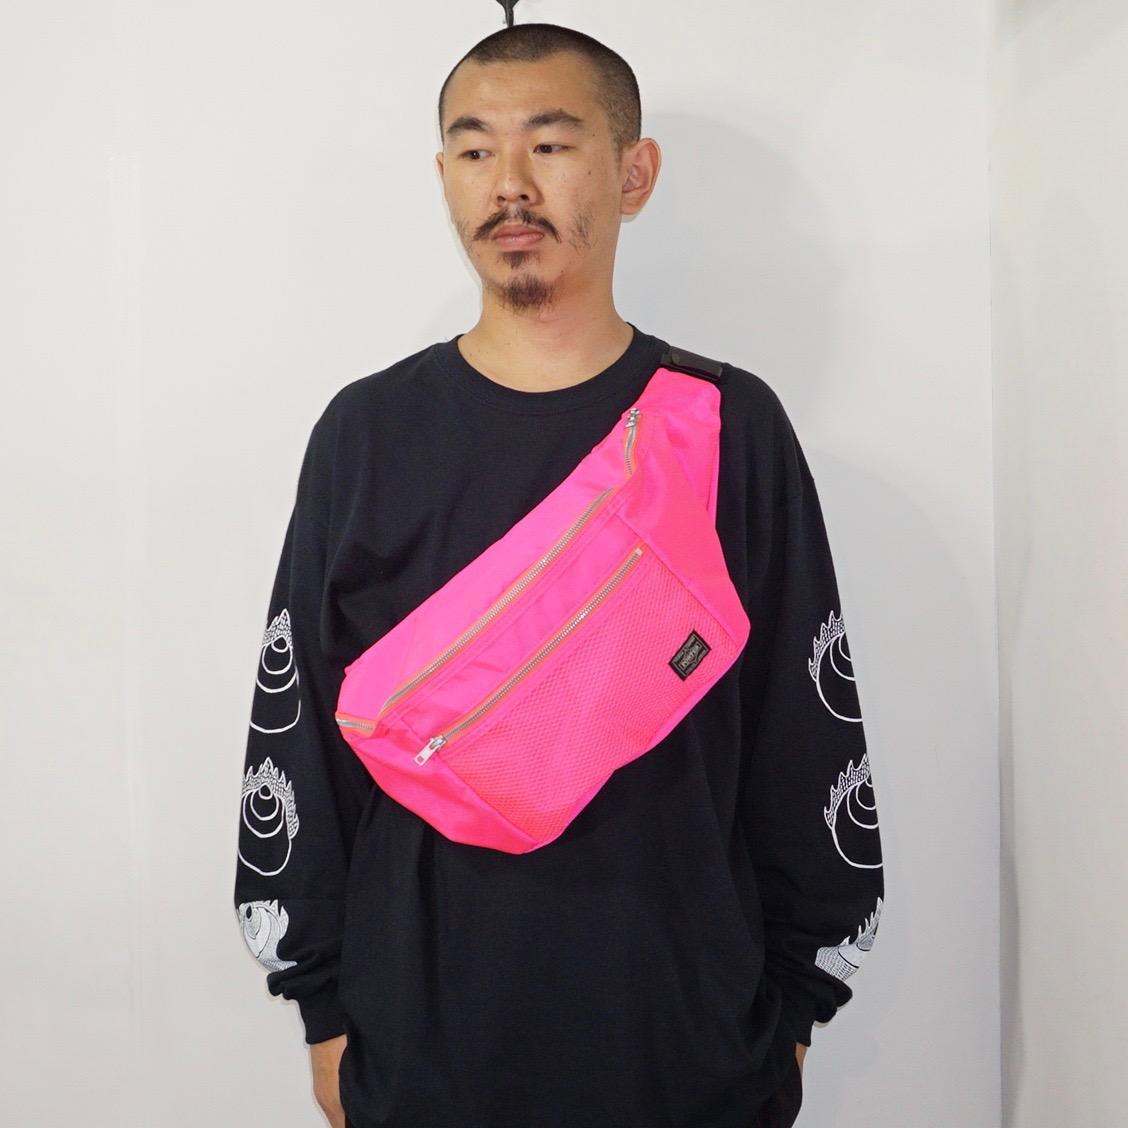 GOOD OL' ×PORTER(グッドオル×ポーター)/BIG SHOULDER BAG(ビックショルダーバッグ)